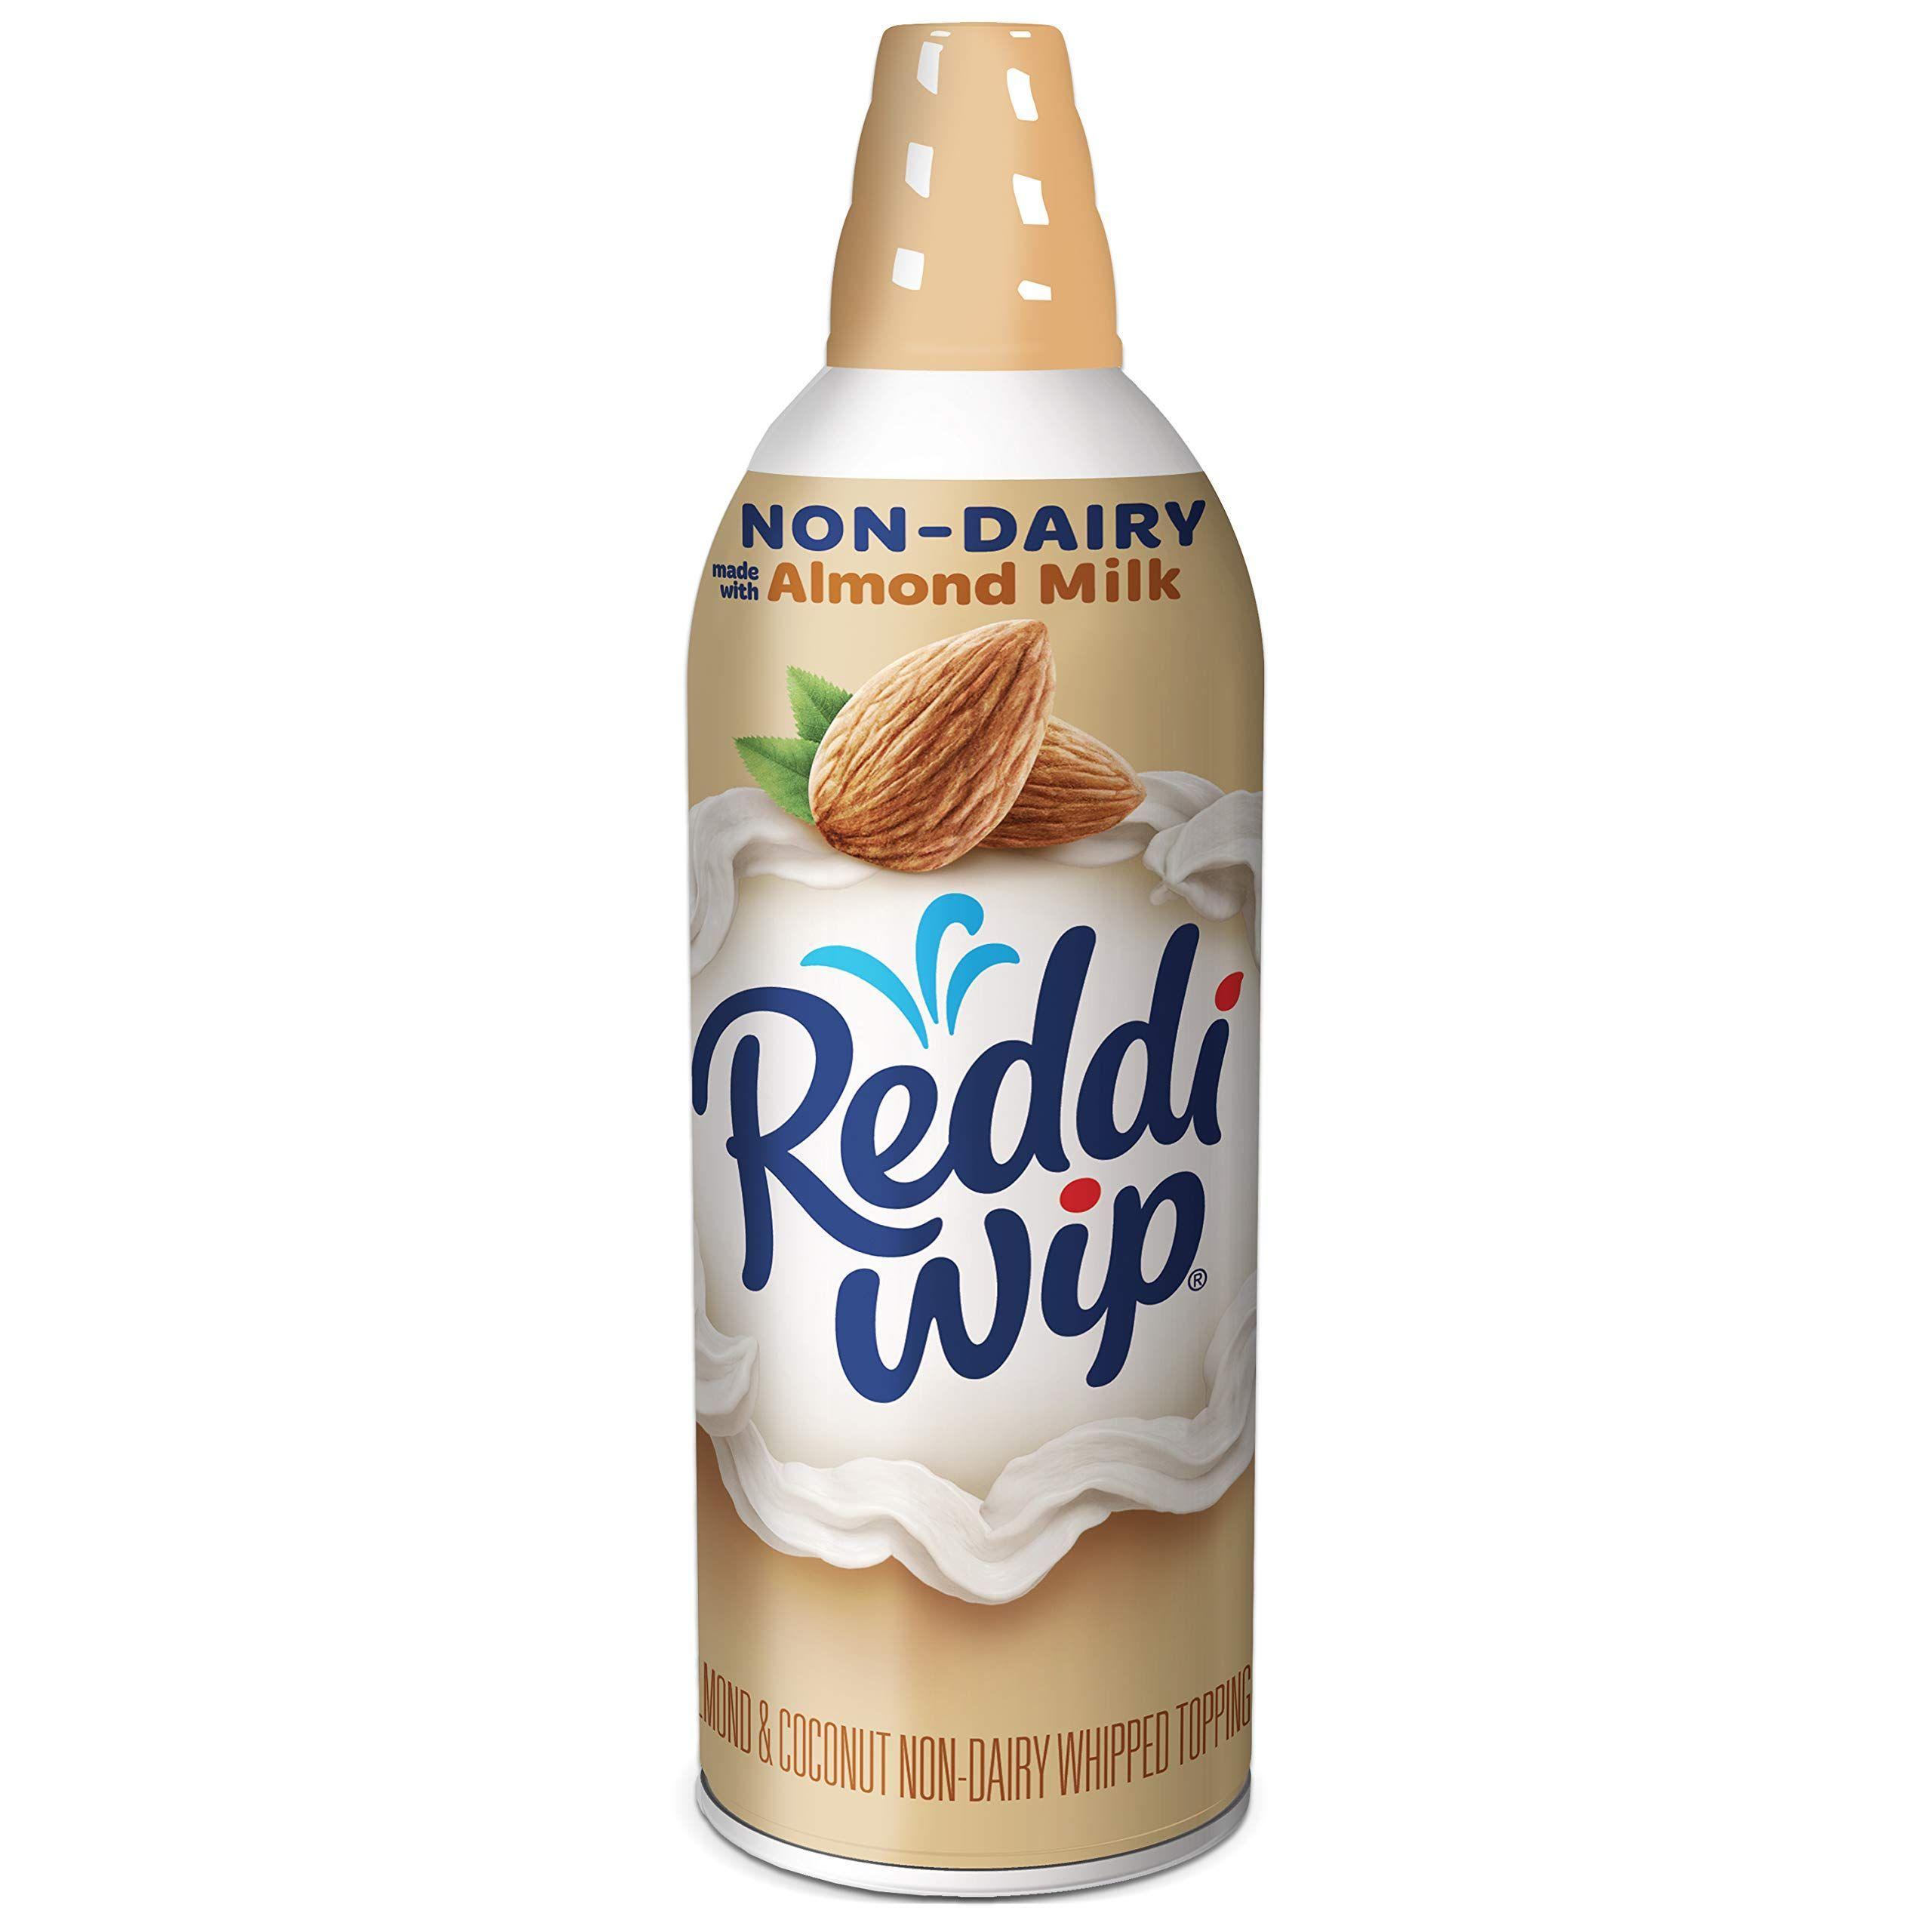 Reddiwip NonDairy Made with Almond Milk Vegan Whipped